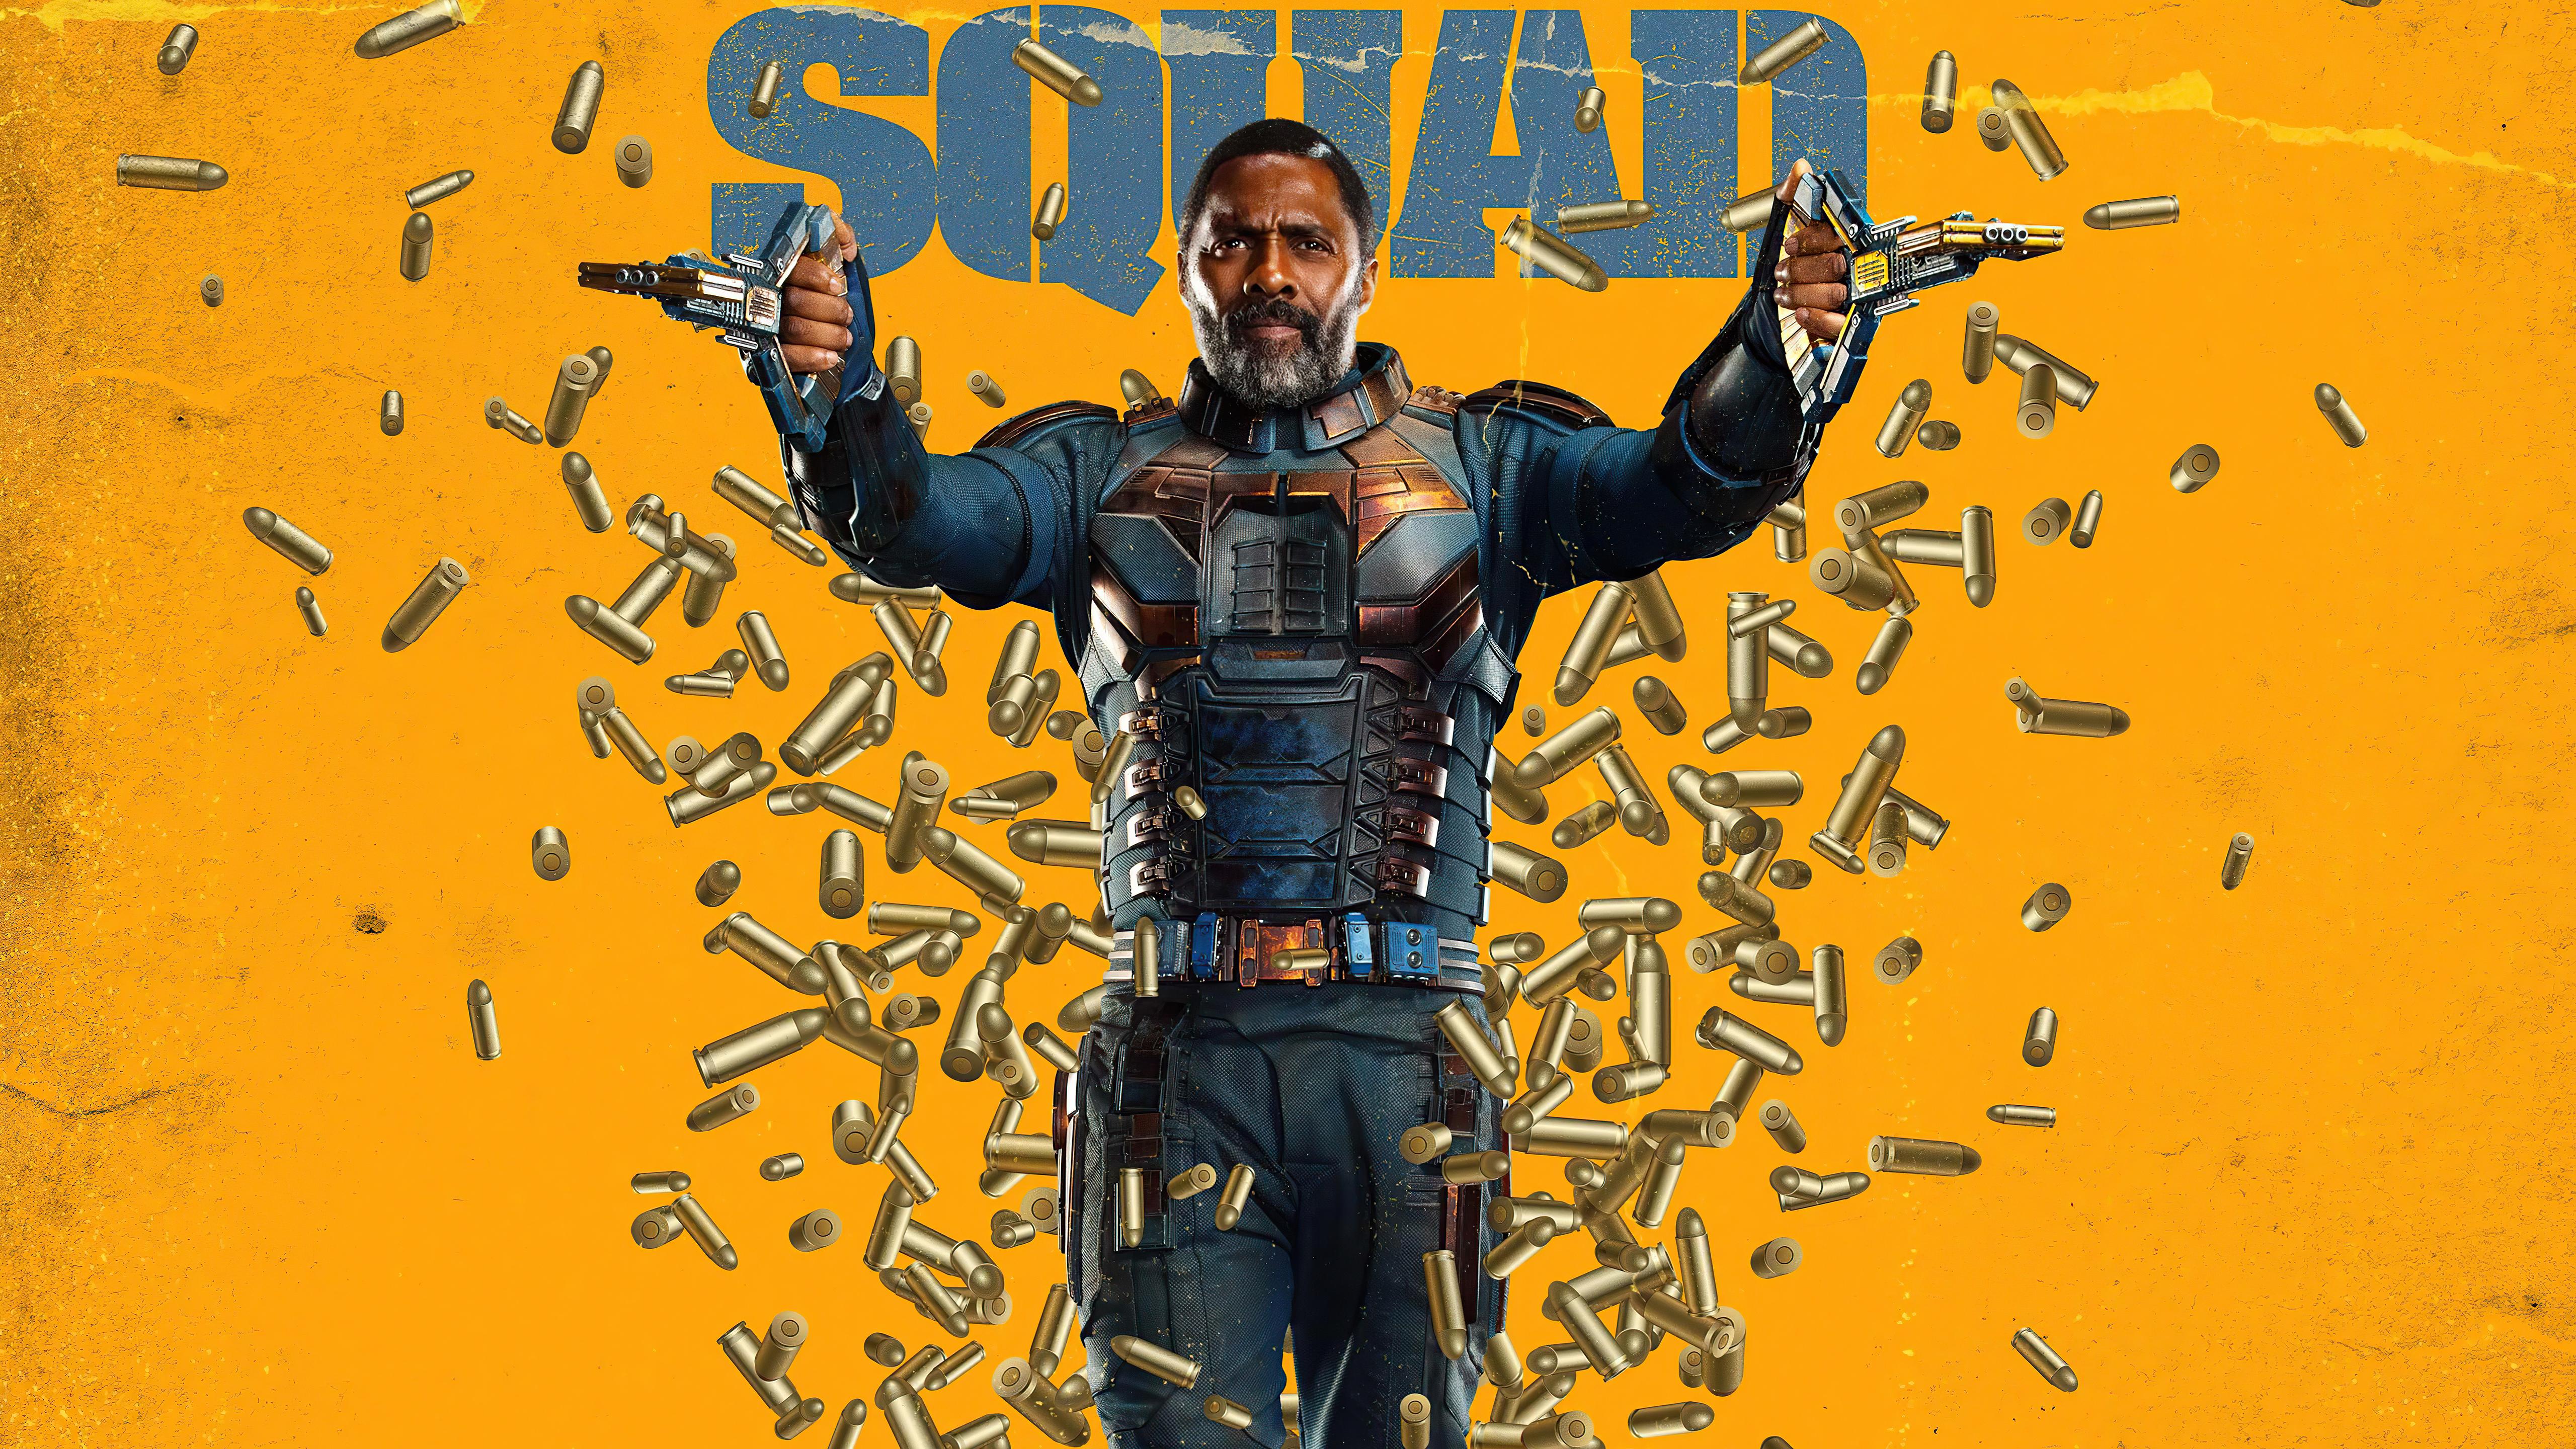 bloodsport the suicide squad 2021 4k 1618166347 - Bloodsport The Suicide Squad 2021 4k - Bloodsport The Suicide Squad 2021 4k wallpapers